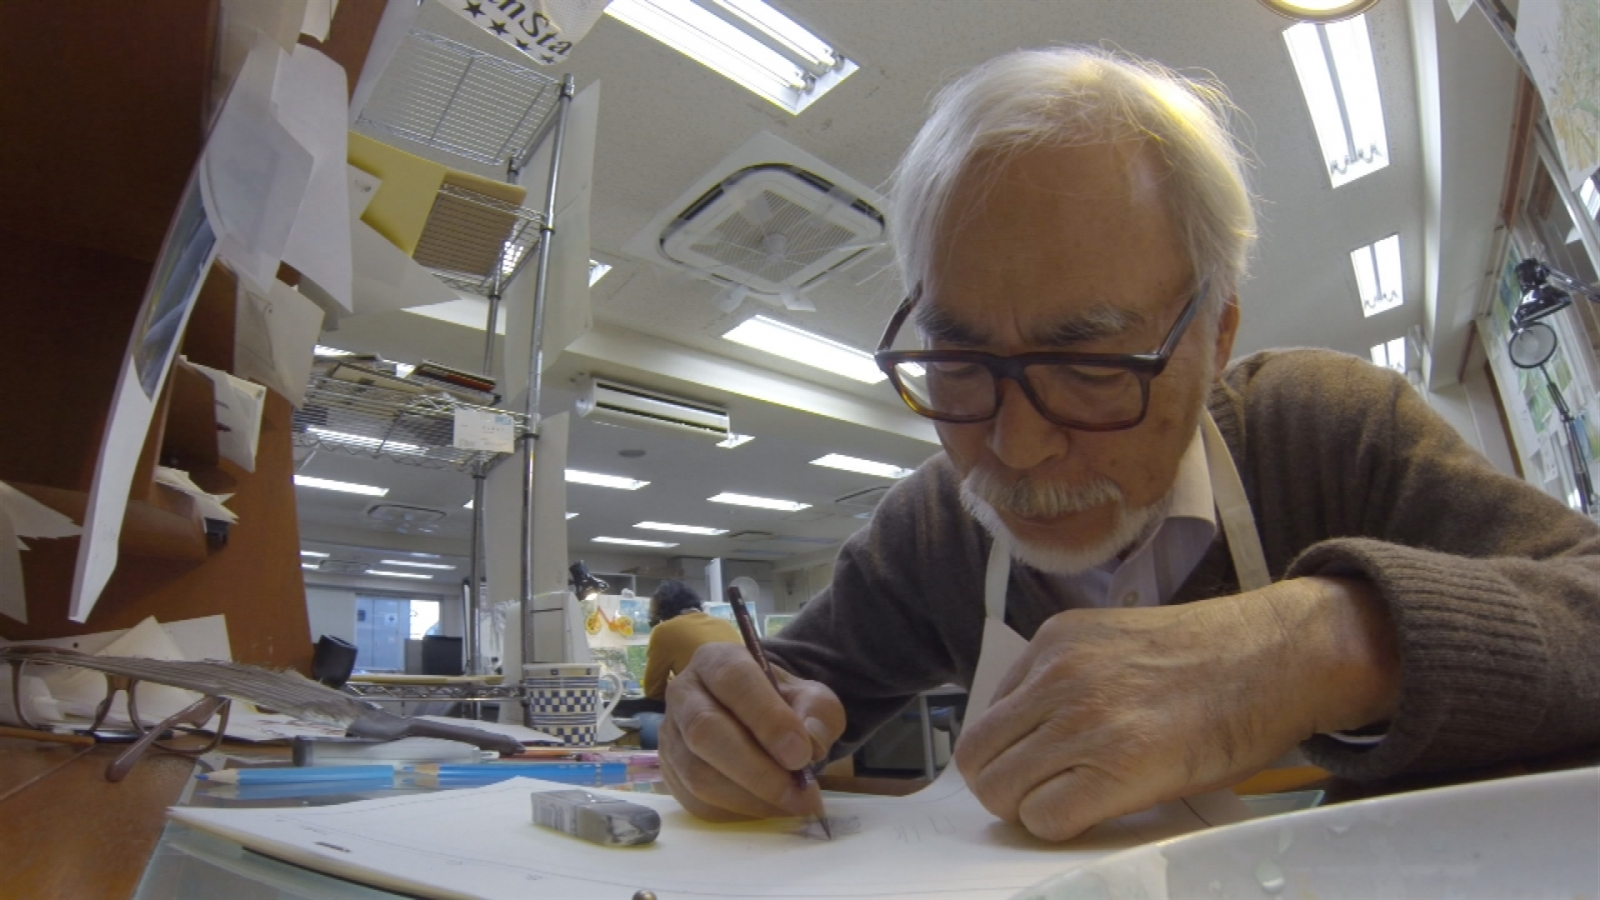 Studio Ghibli founder Hayao Miyazaki